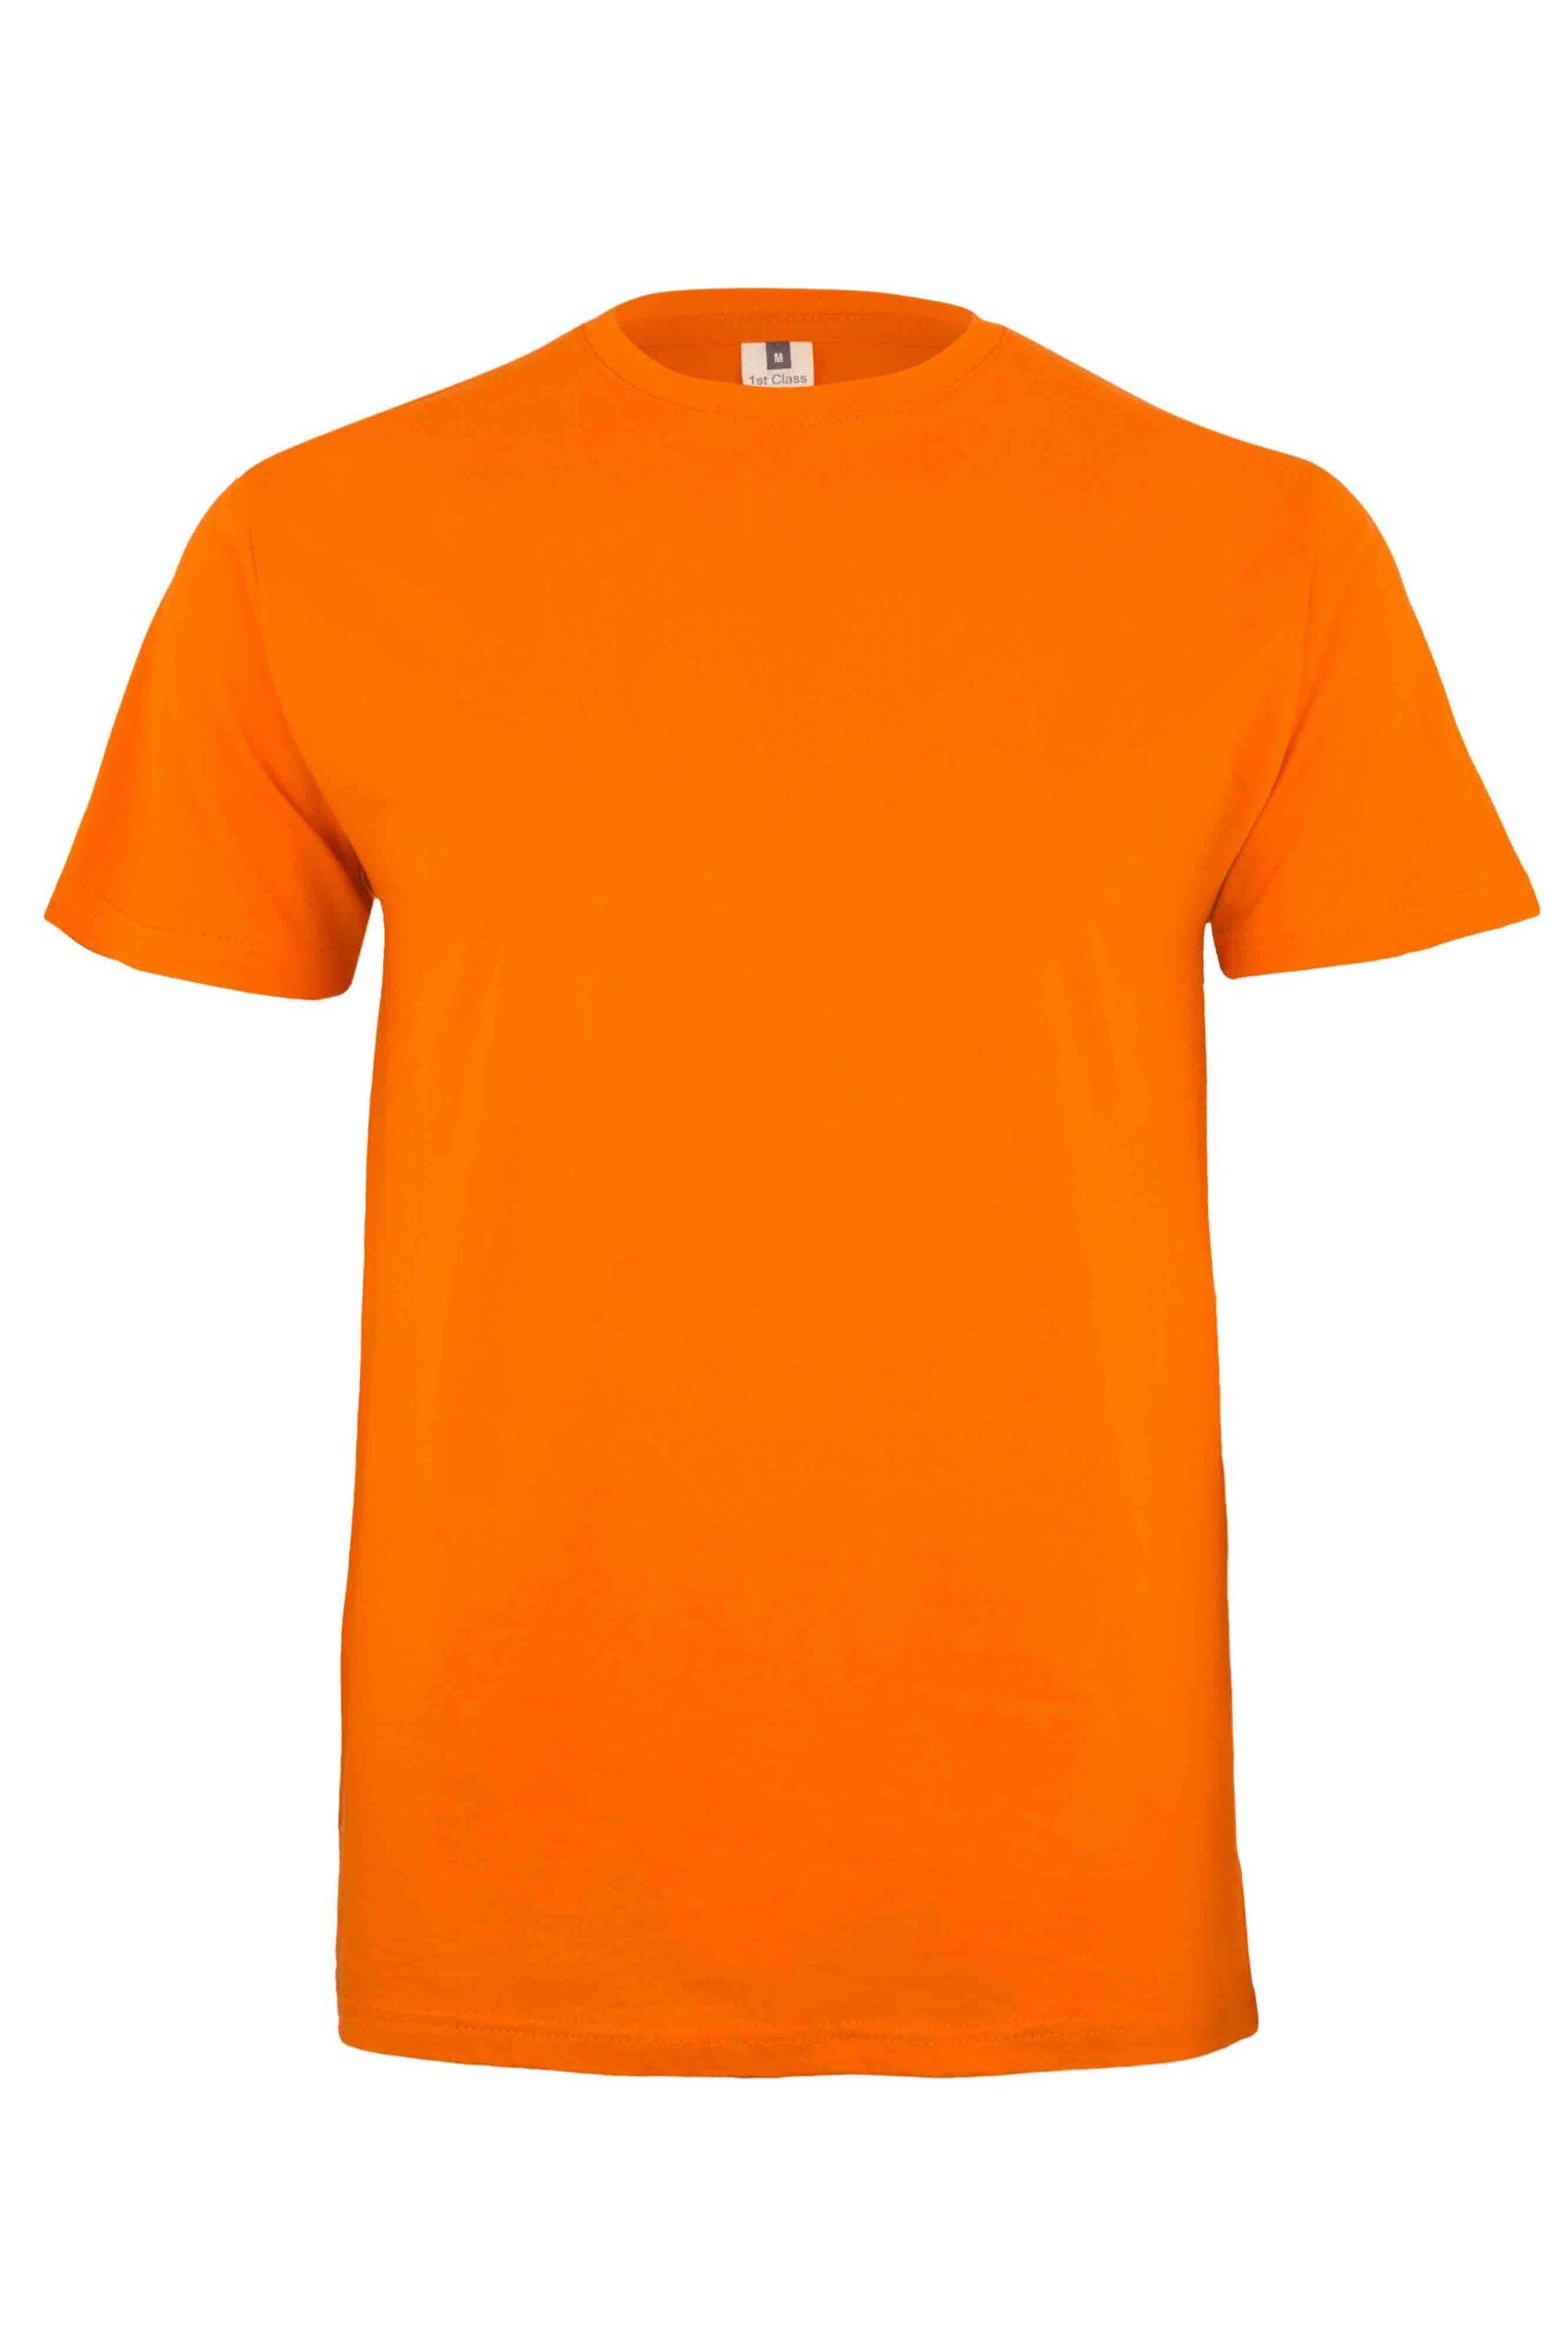 Mukua Mk023cv Camiseta Manga Corta Color 190gr Orange